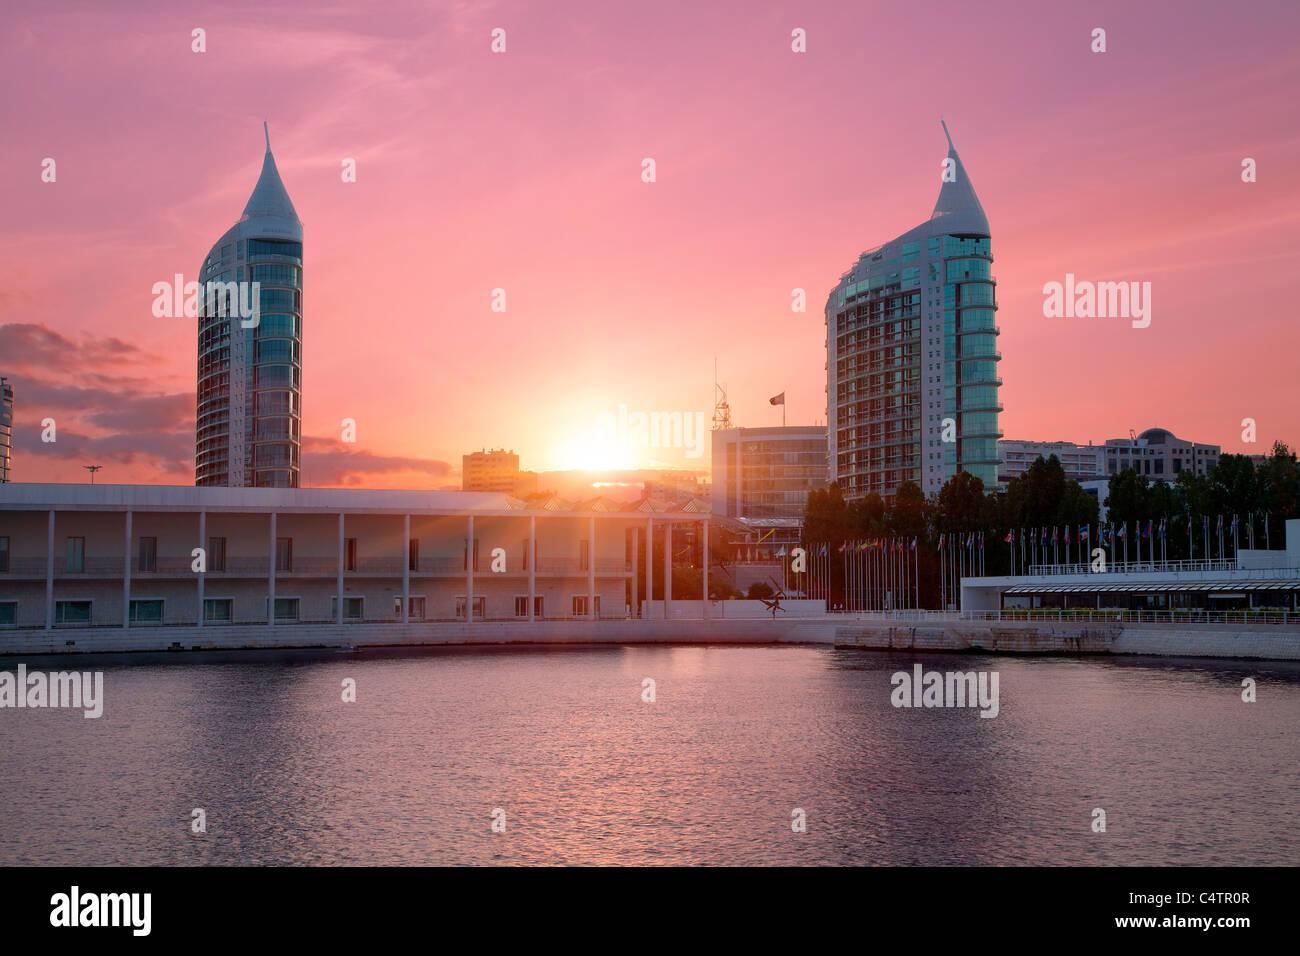 Europe, Portugal, Lisbon, Sao Gabriel and Sao Rafael Twin Towers at Sunset Stock Photo